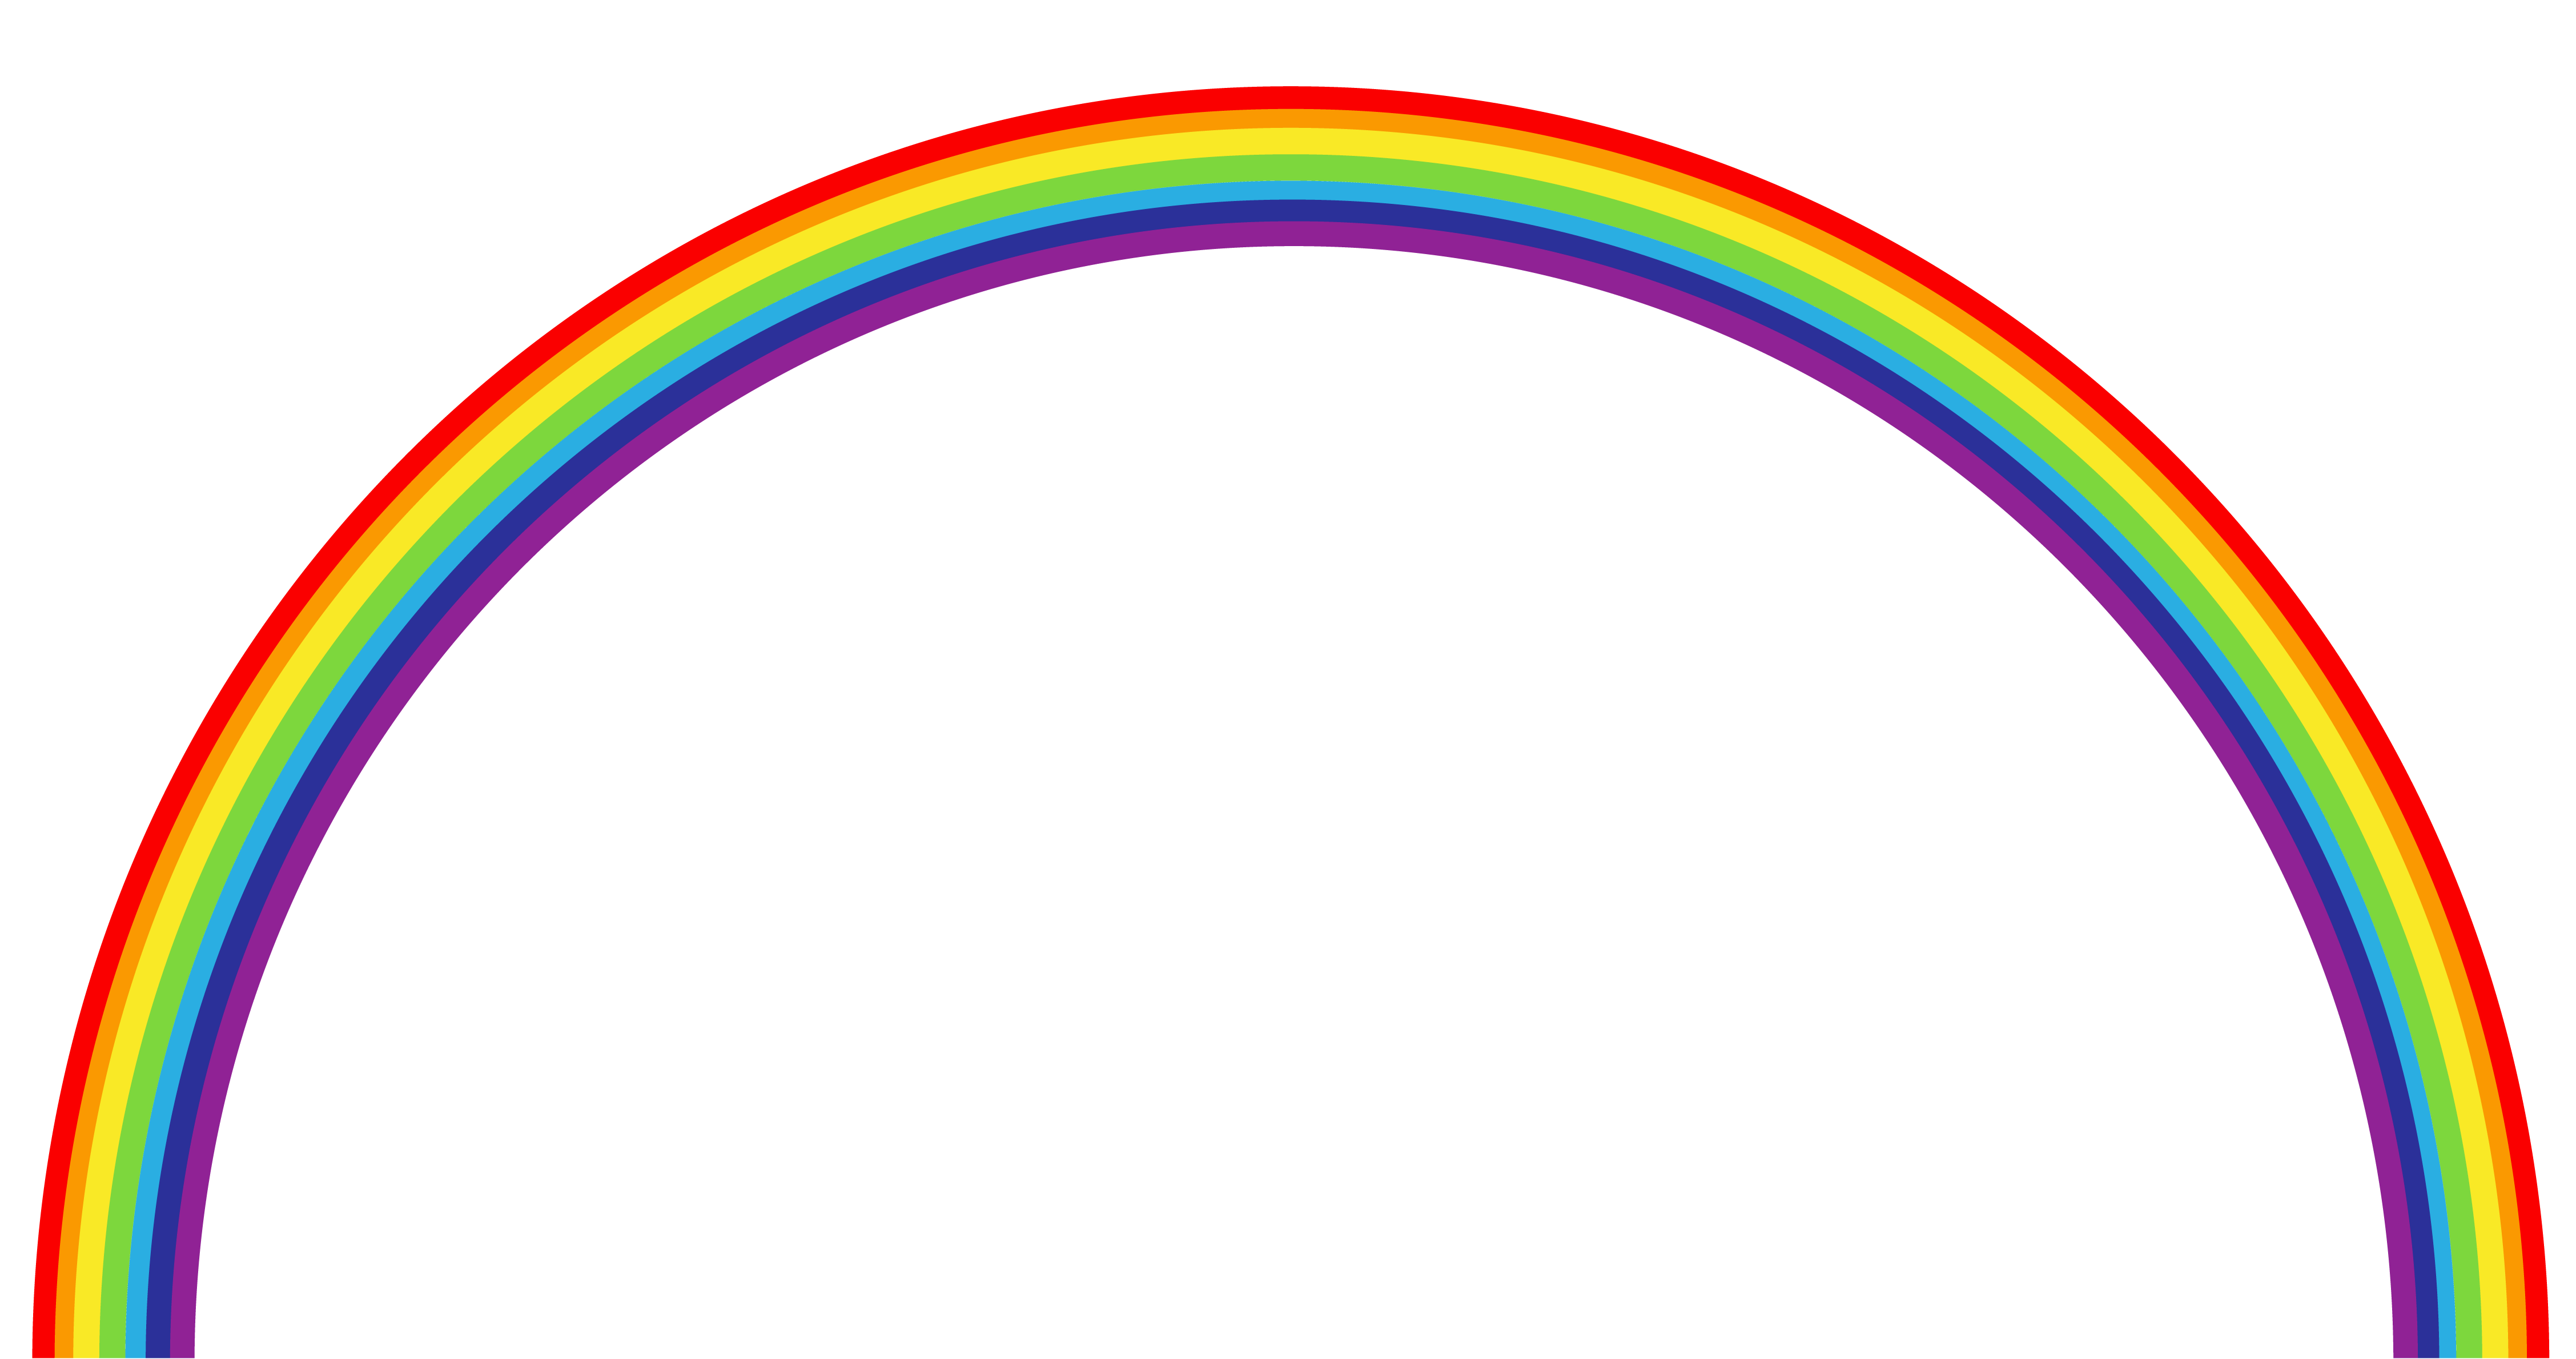 Rainbow png clipart best for Transparent top design